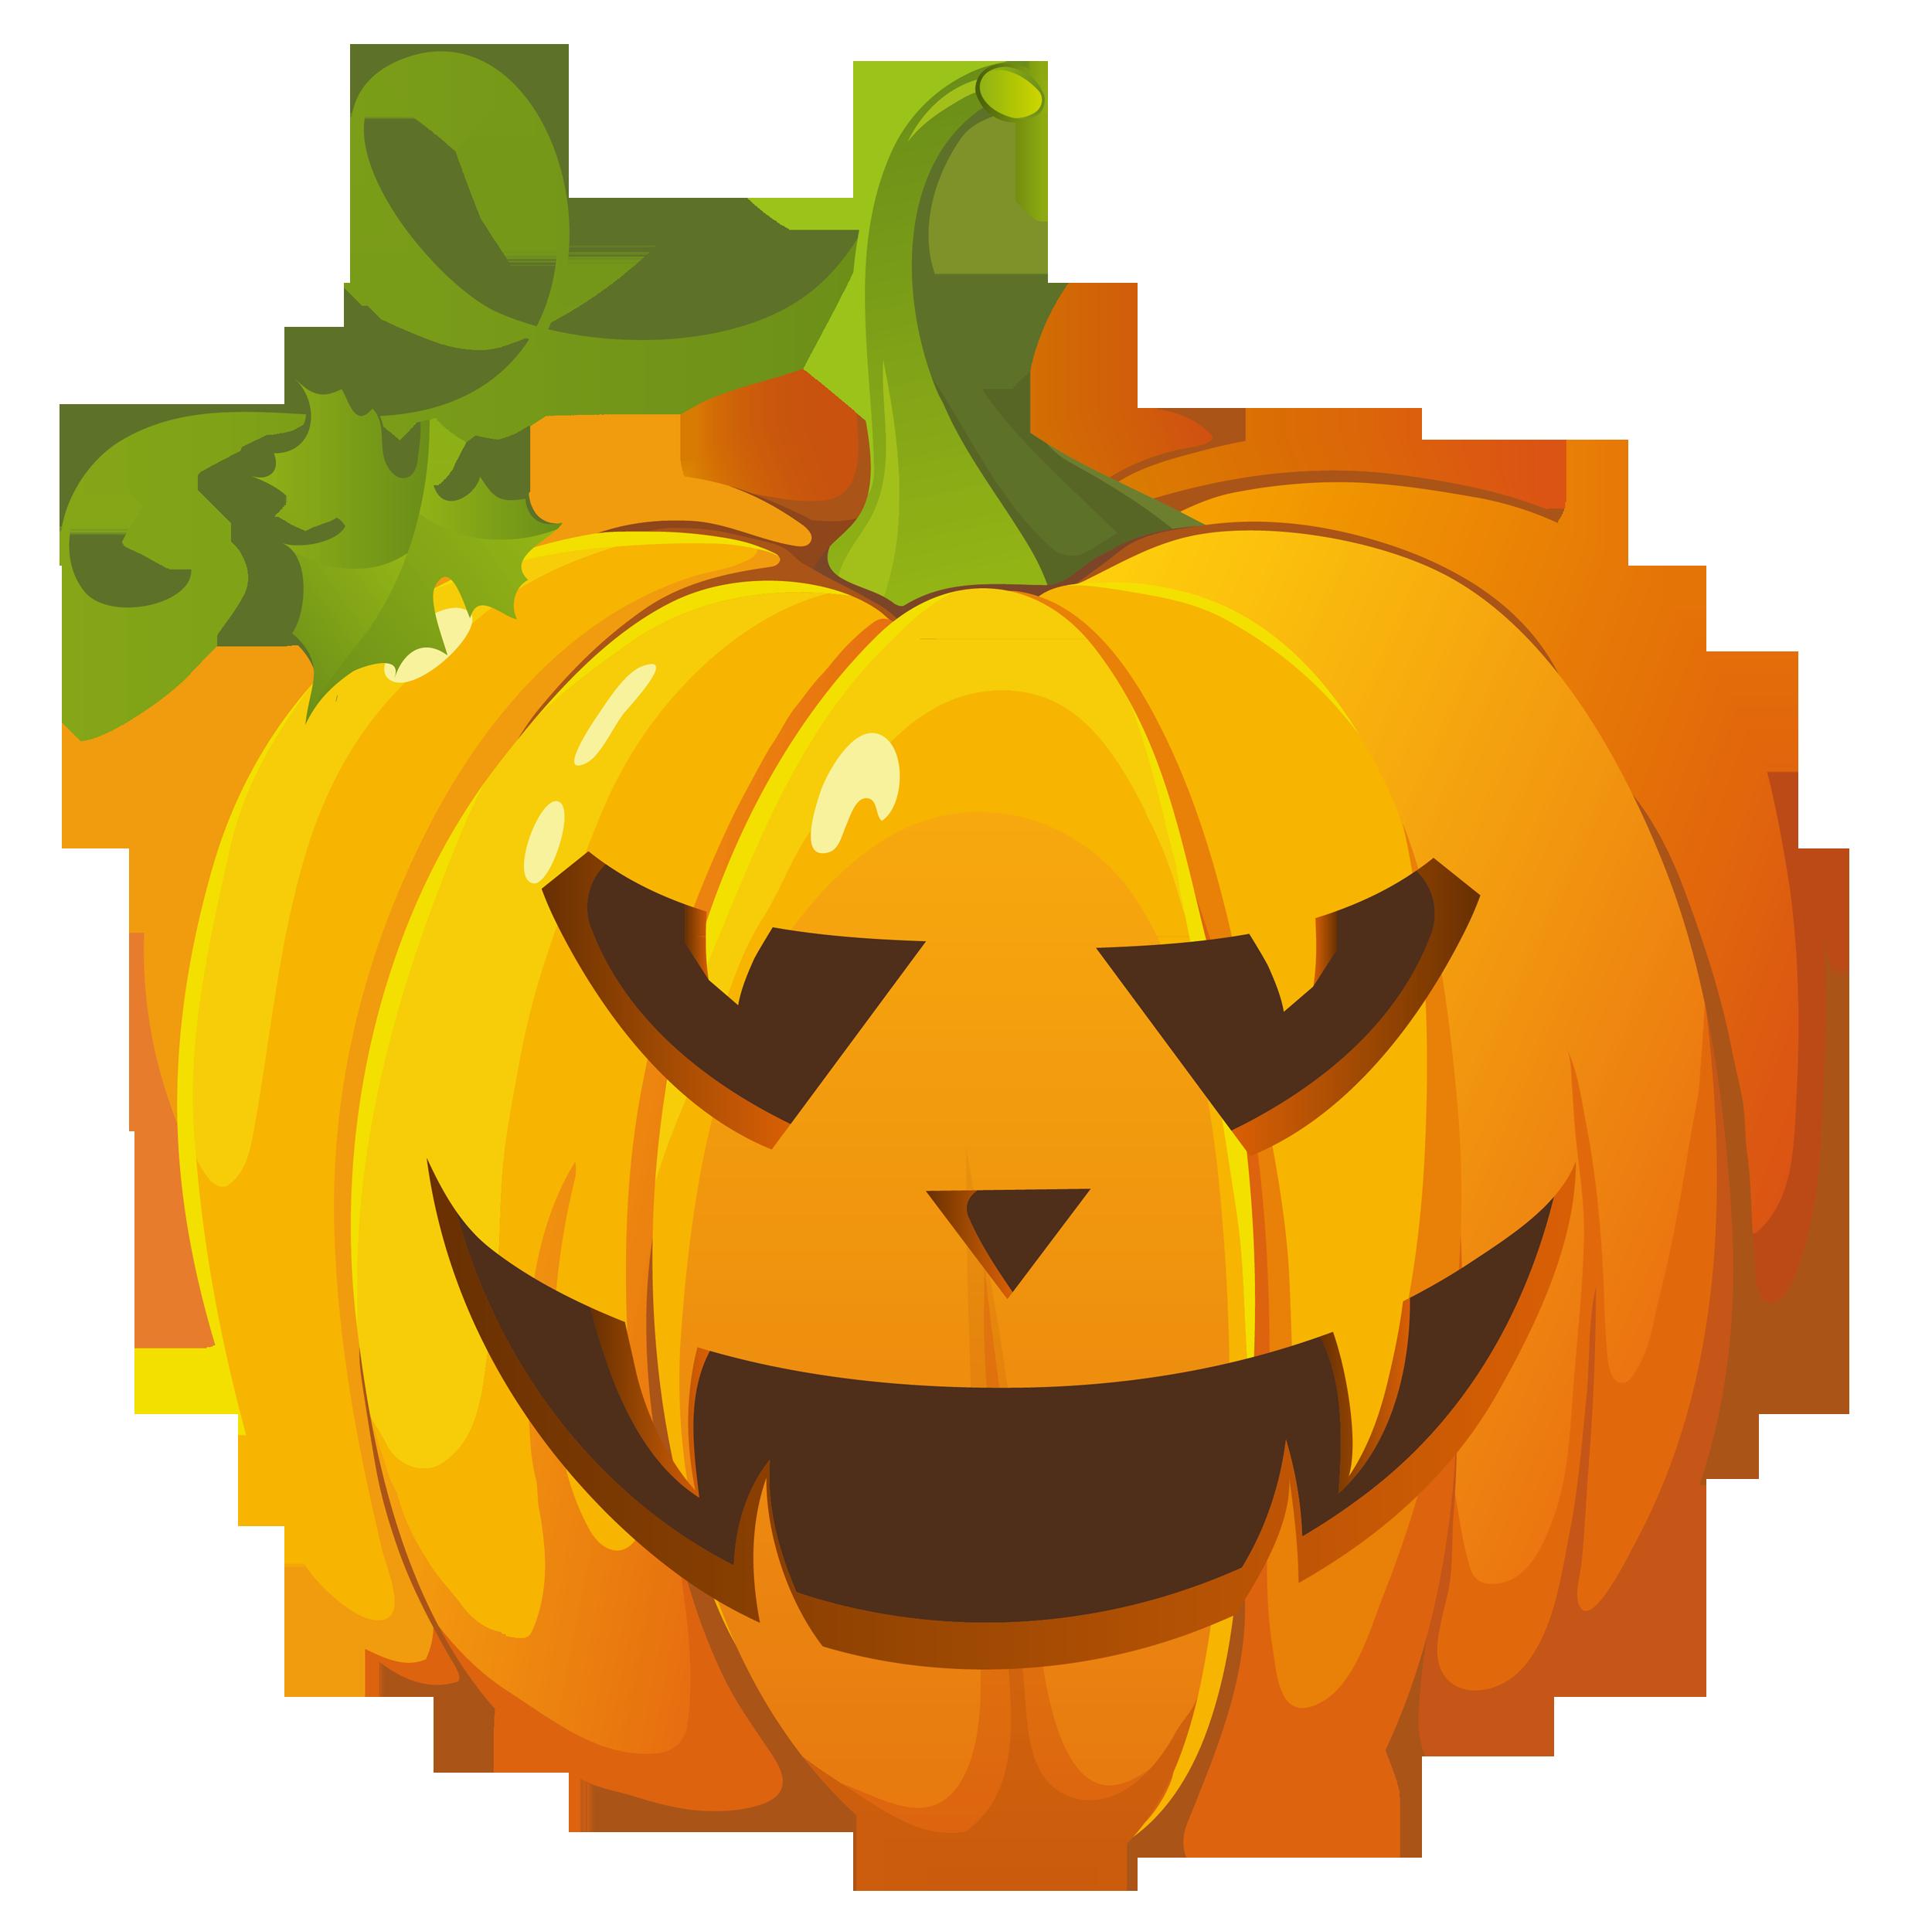 Pumpkin clipart solid. Free halloween at getdrawings